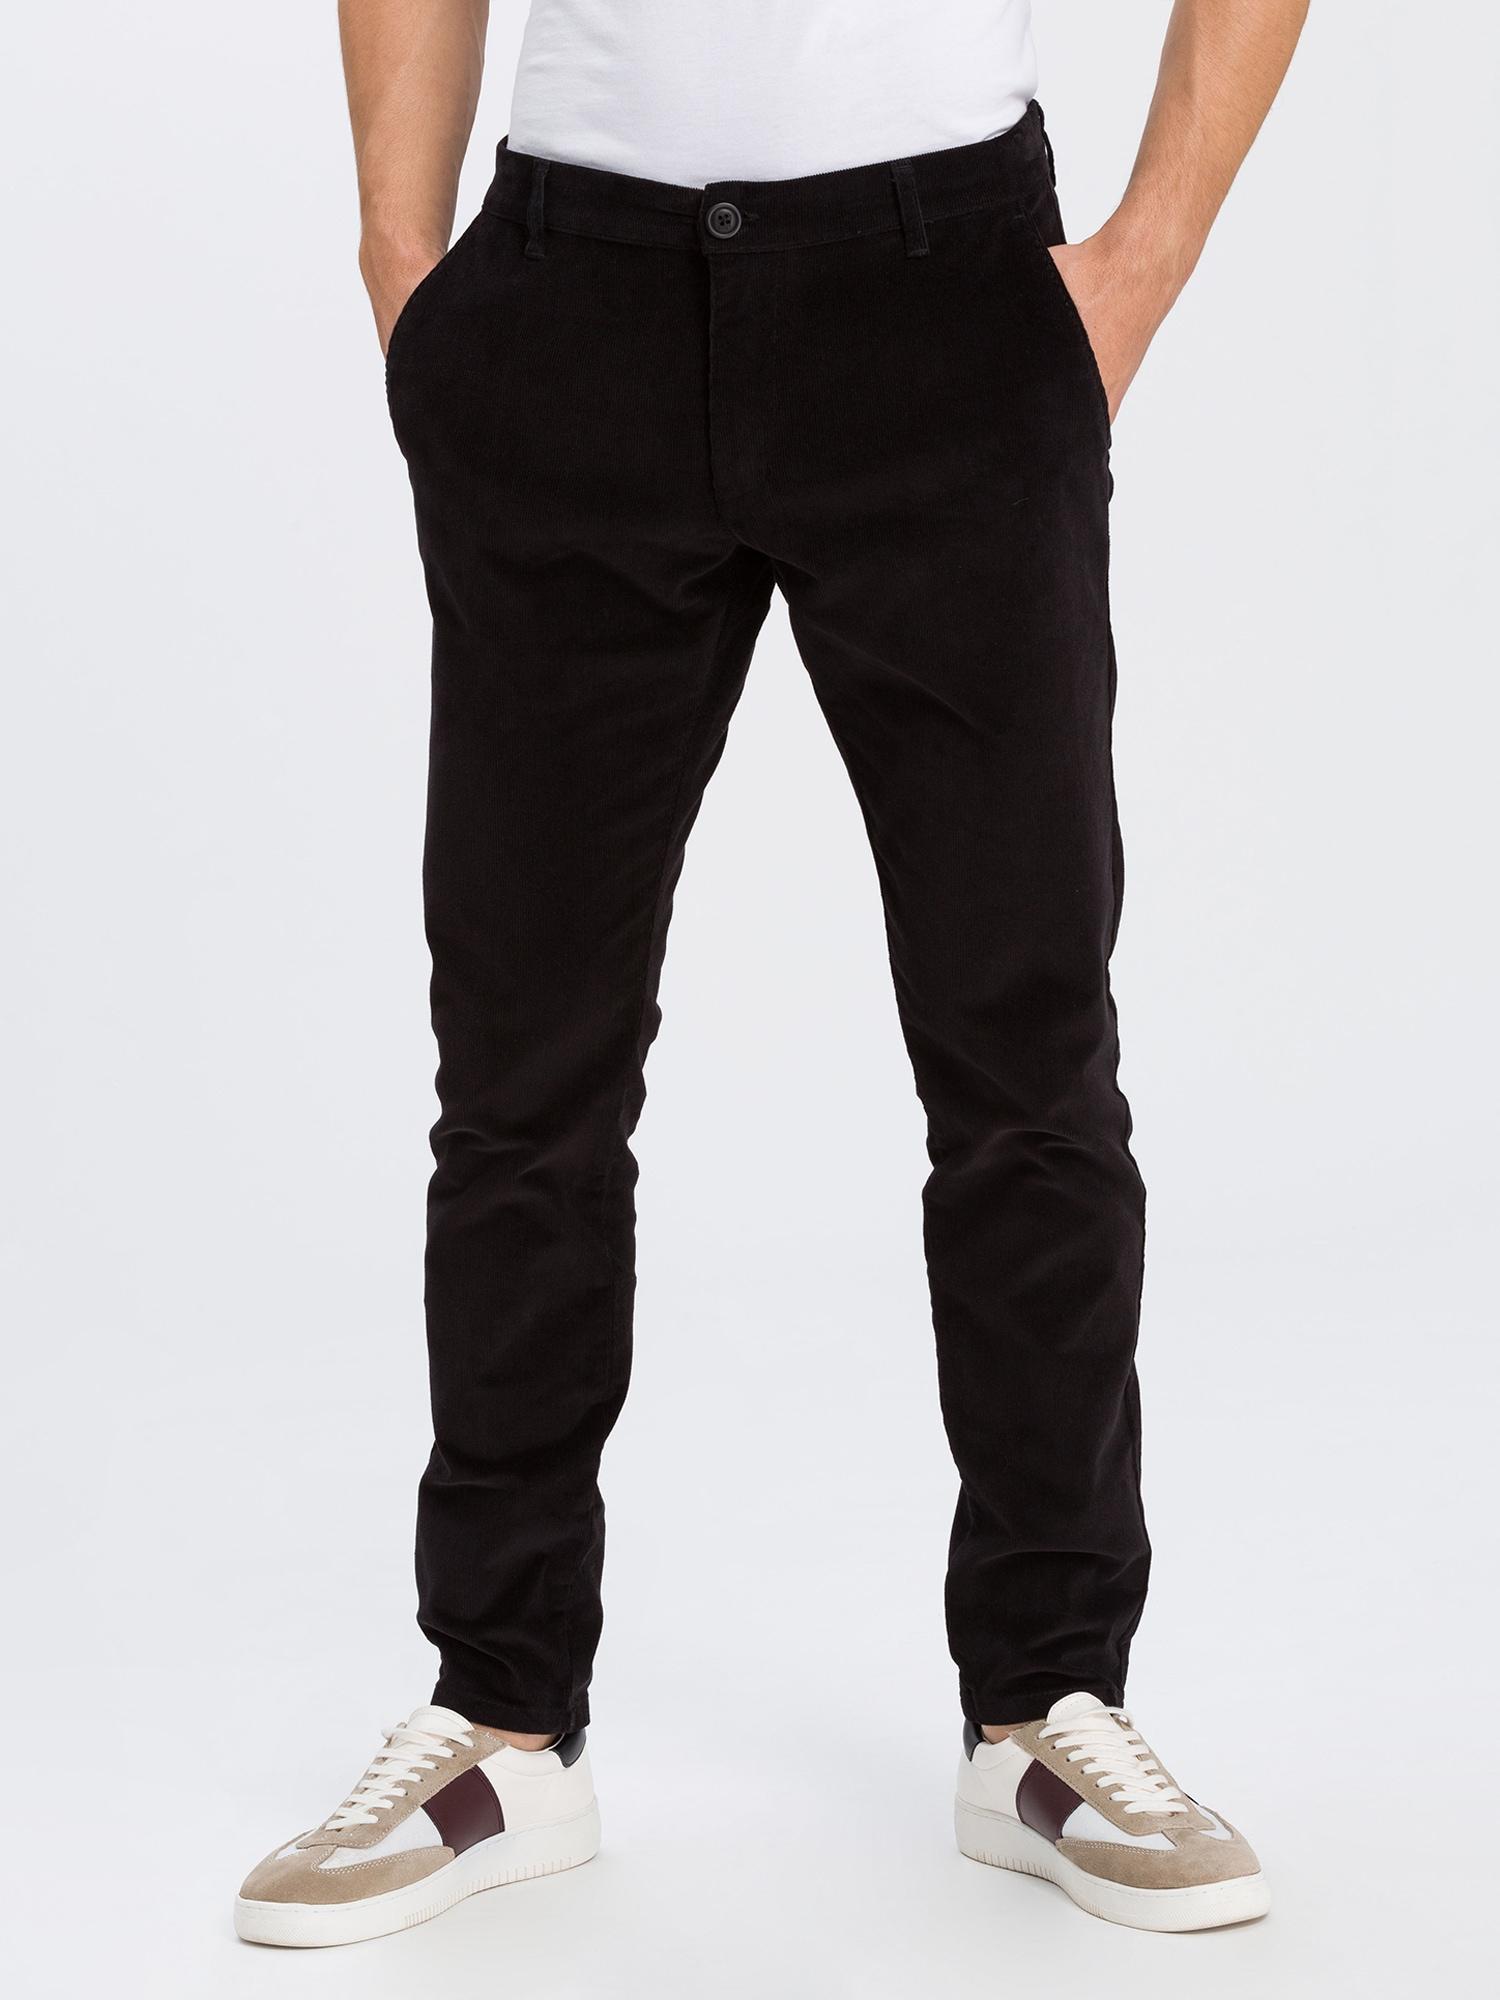 Cross Jeans Cordhose E 120 | Bekleidung > Hosen > Cordhosen | cross jeans